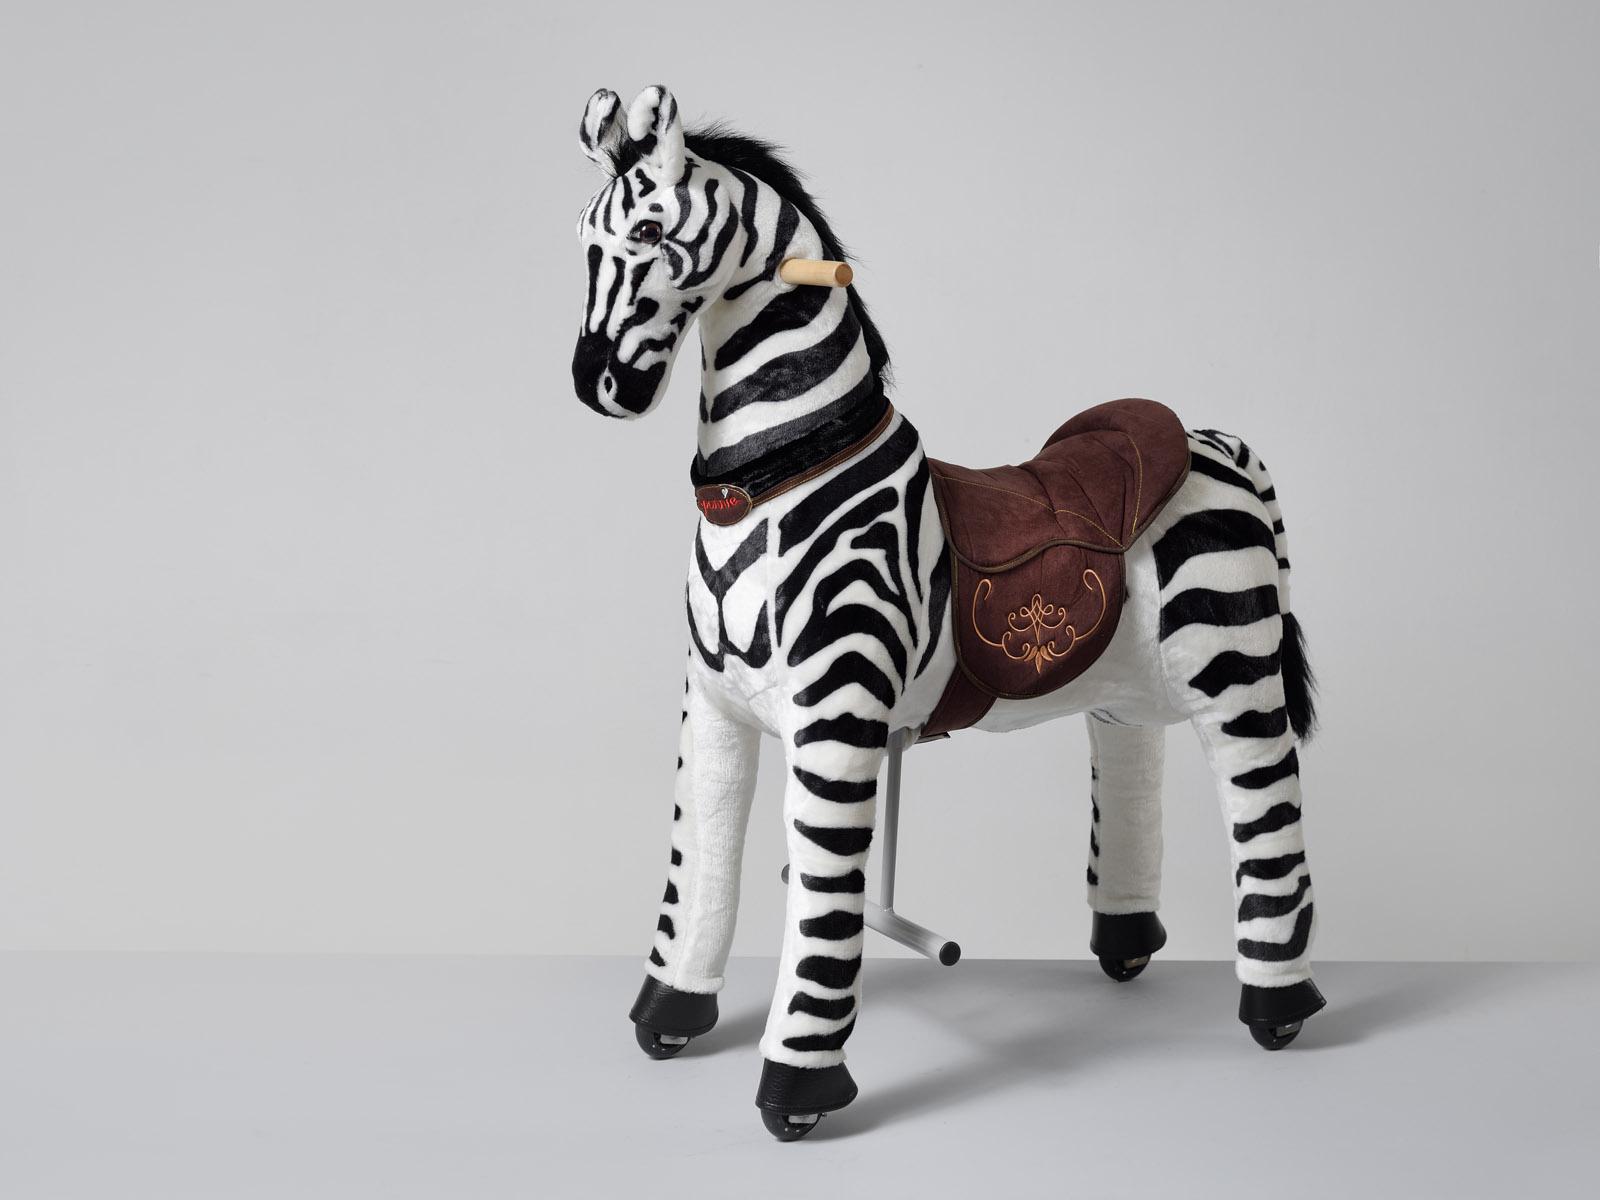 Jezdící zebra Ponnie Dixi M